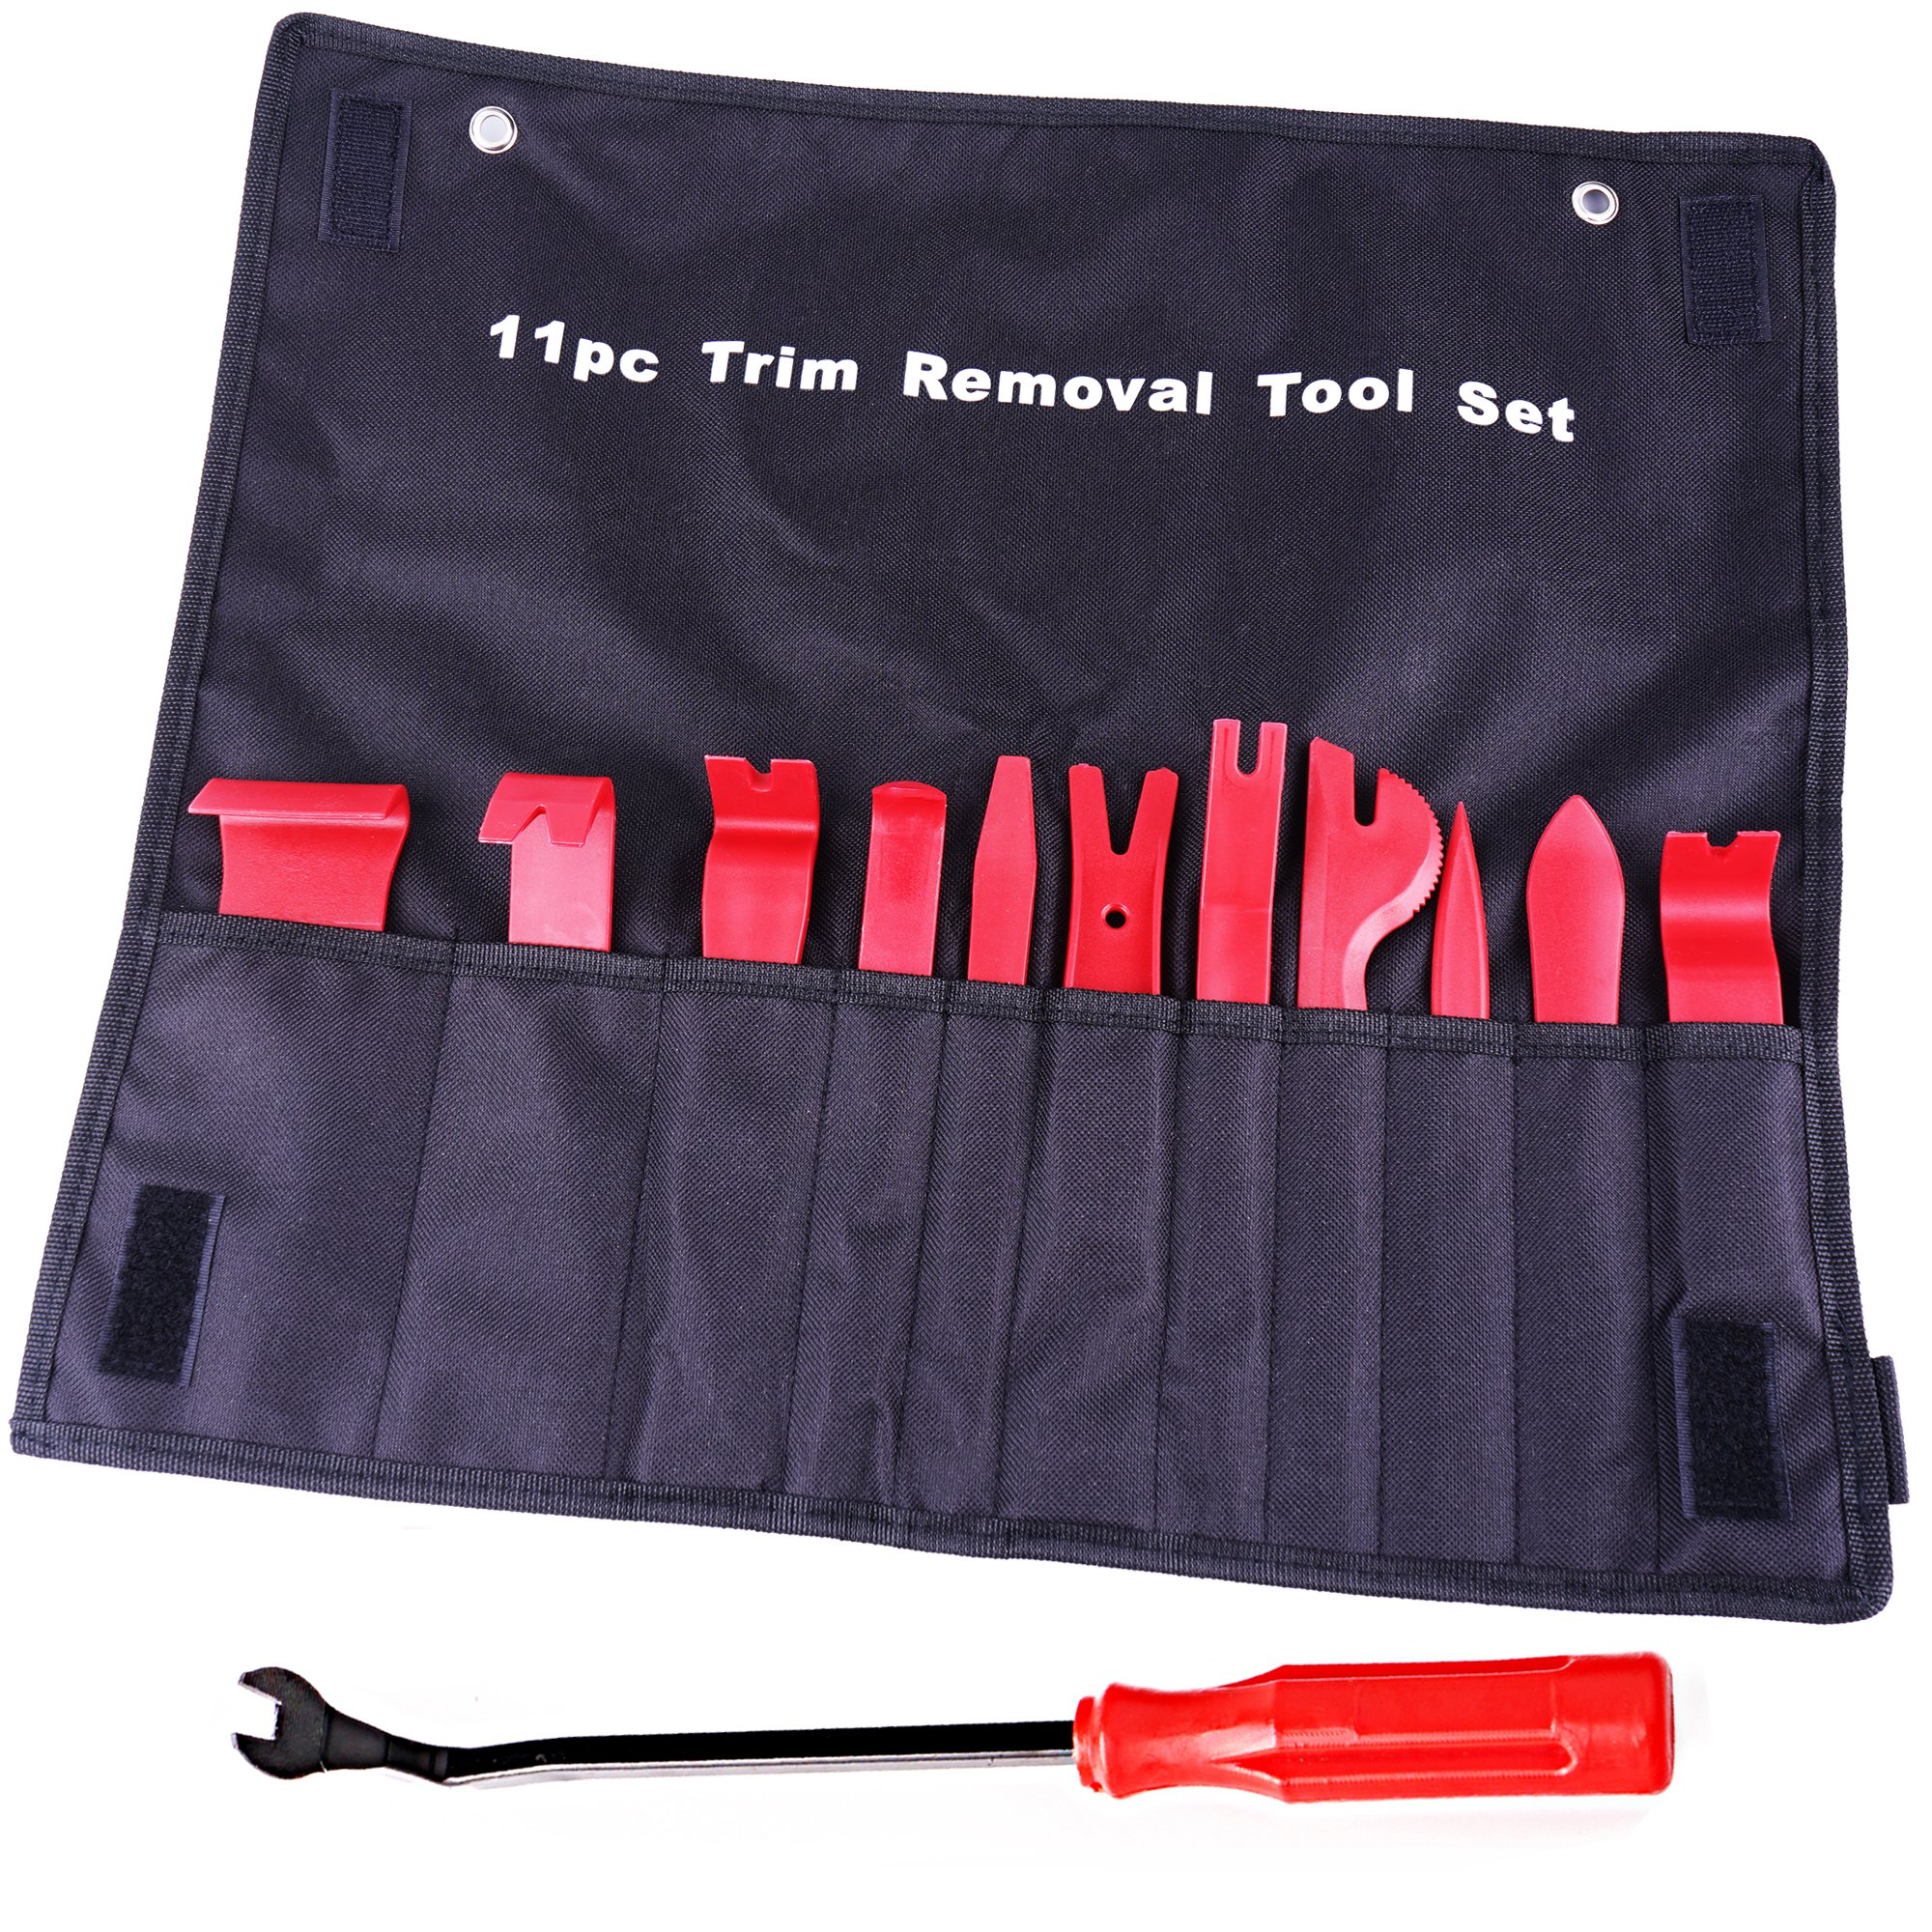 ATOP VALUE 12 Pcs Auto Upholstery Tools, Strong Nylon Door Molding Dash Panel Trim Tool Kit, Durable Nylon Storage Bag - Red